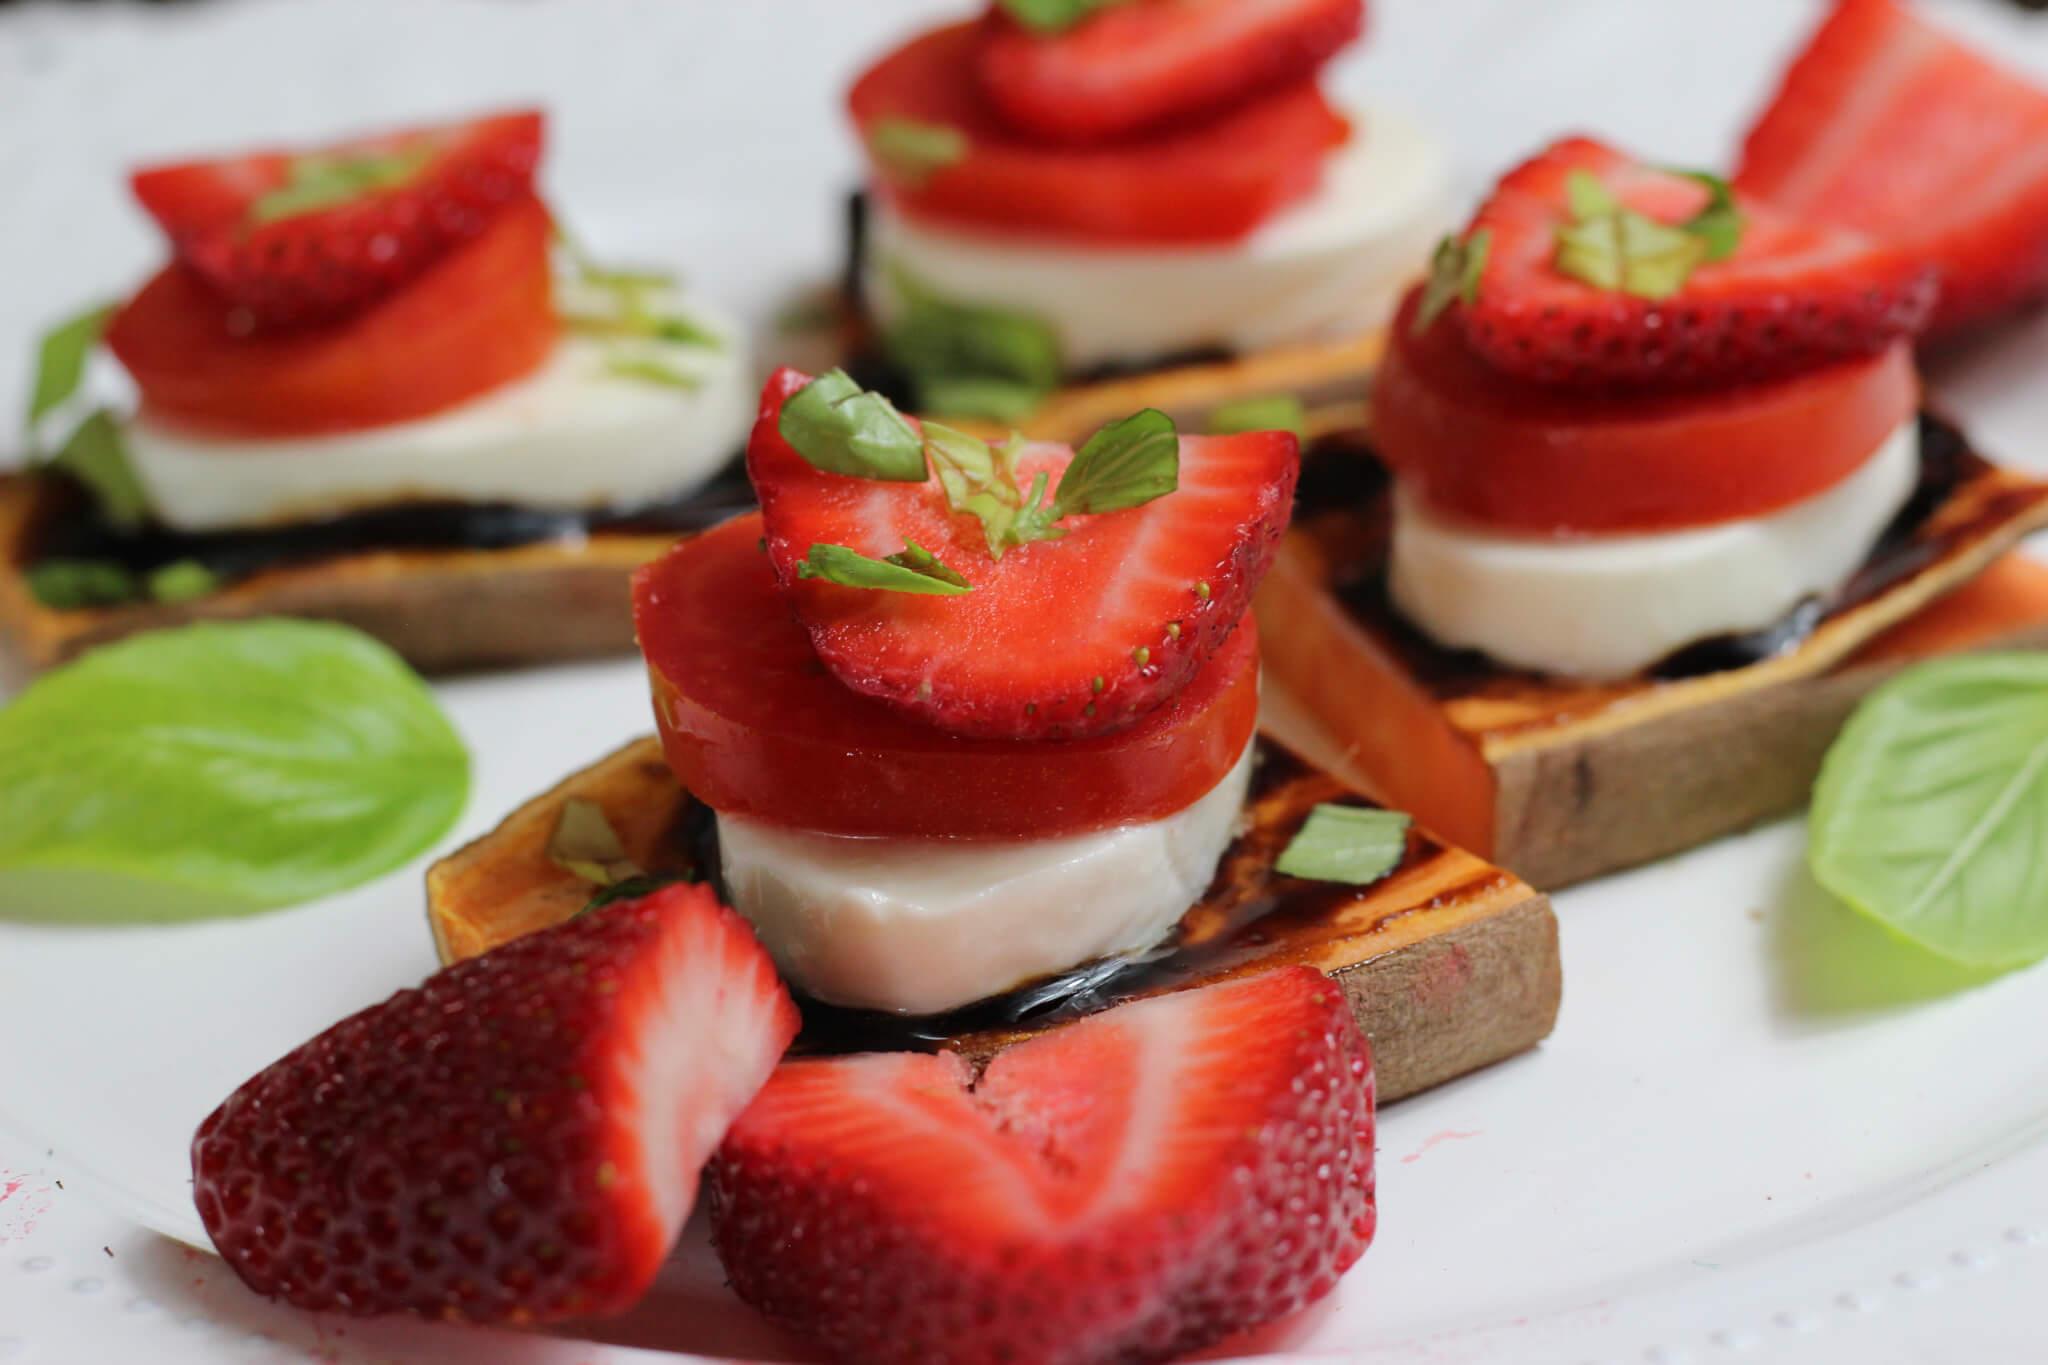 Sweet Potato Caprese Bites with Wish Farms Strawberries